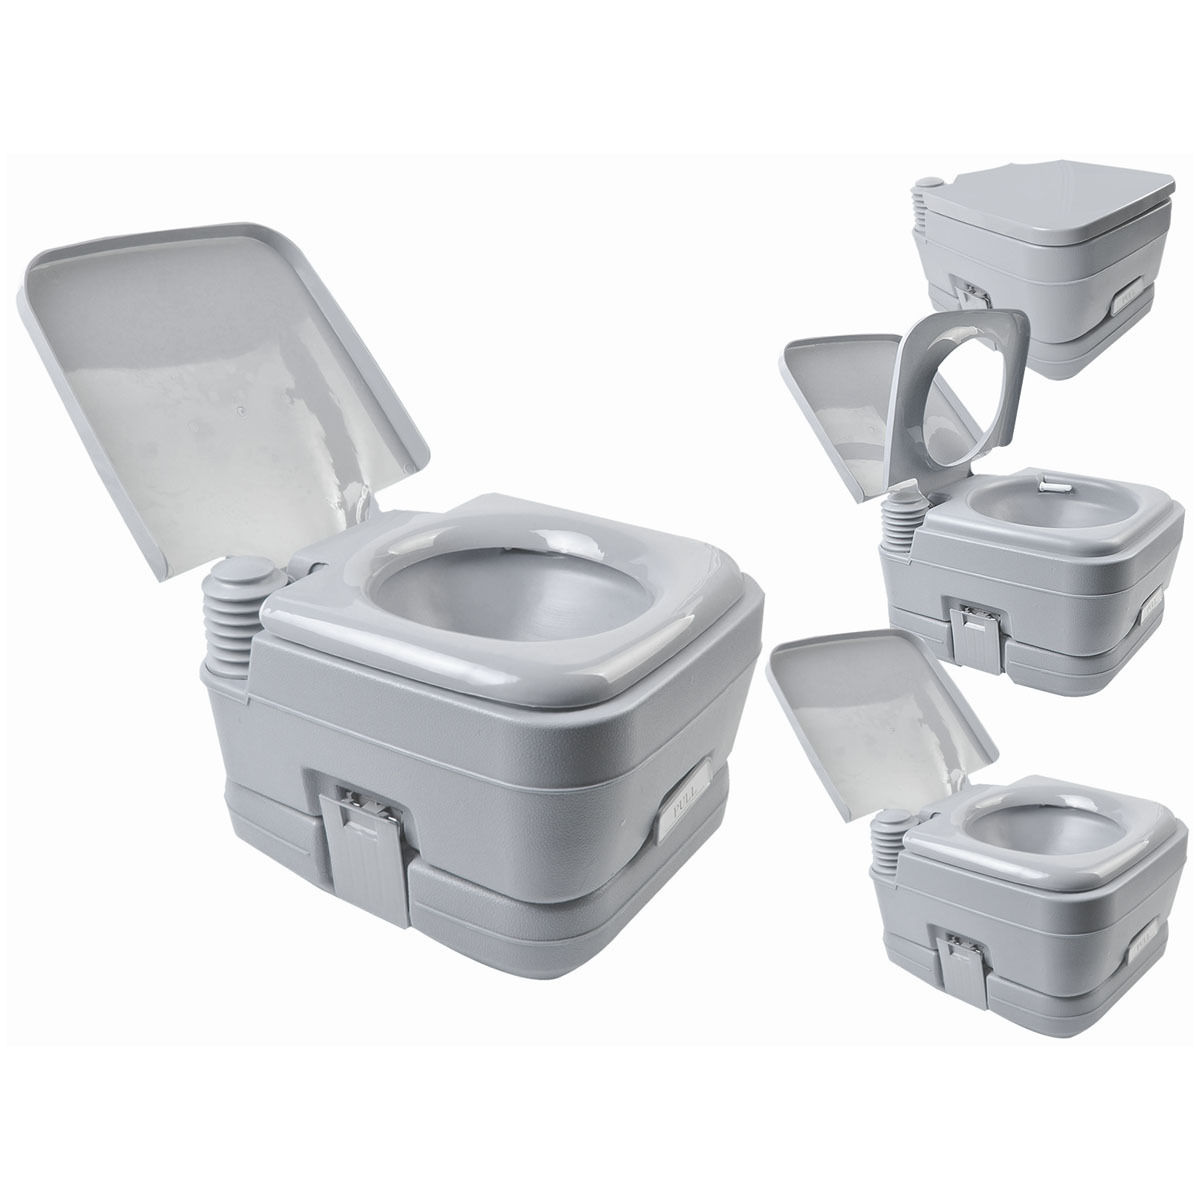 2 8 gallon 10l portable toilet travel camping hiking outdoor toilet potty flush ebay. Black Bedroom Furniture Sets. Home Design Ideas